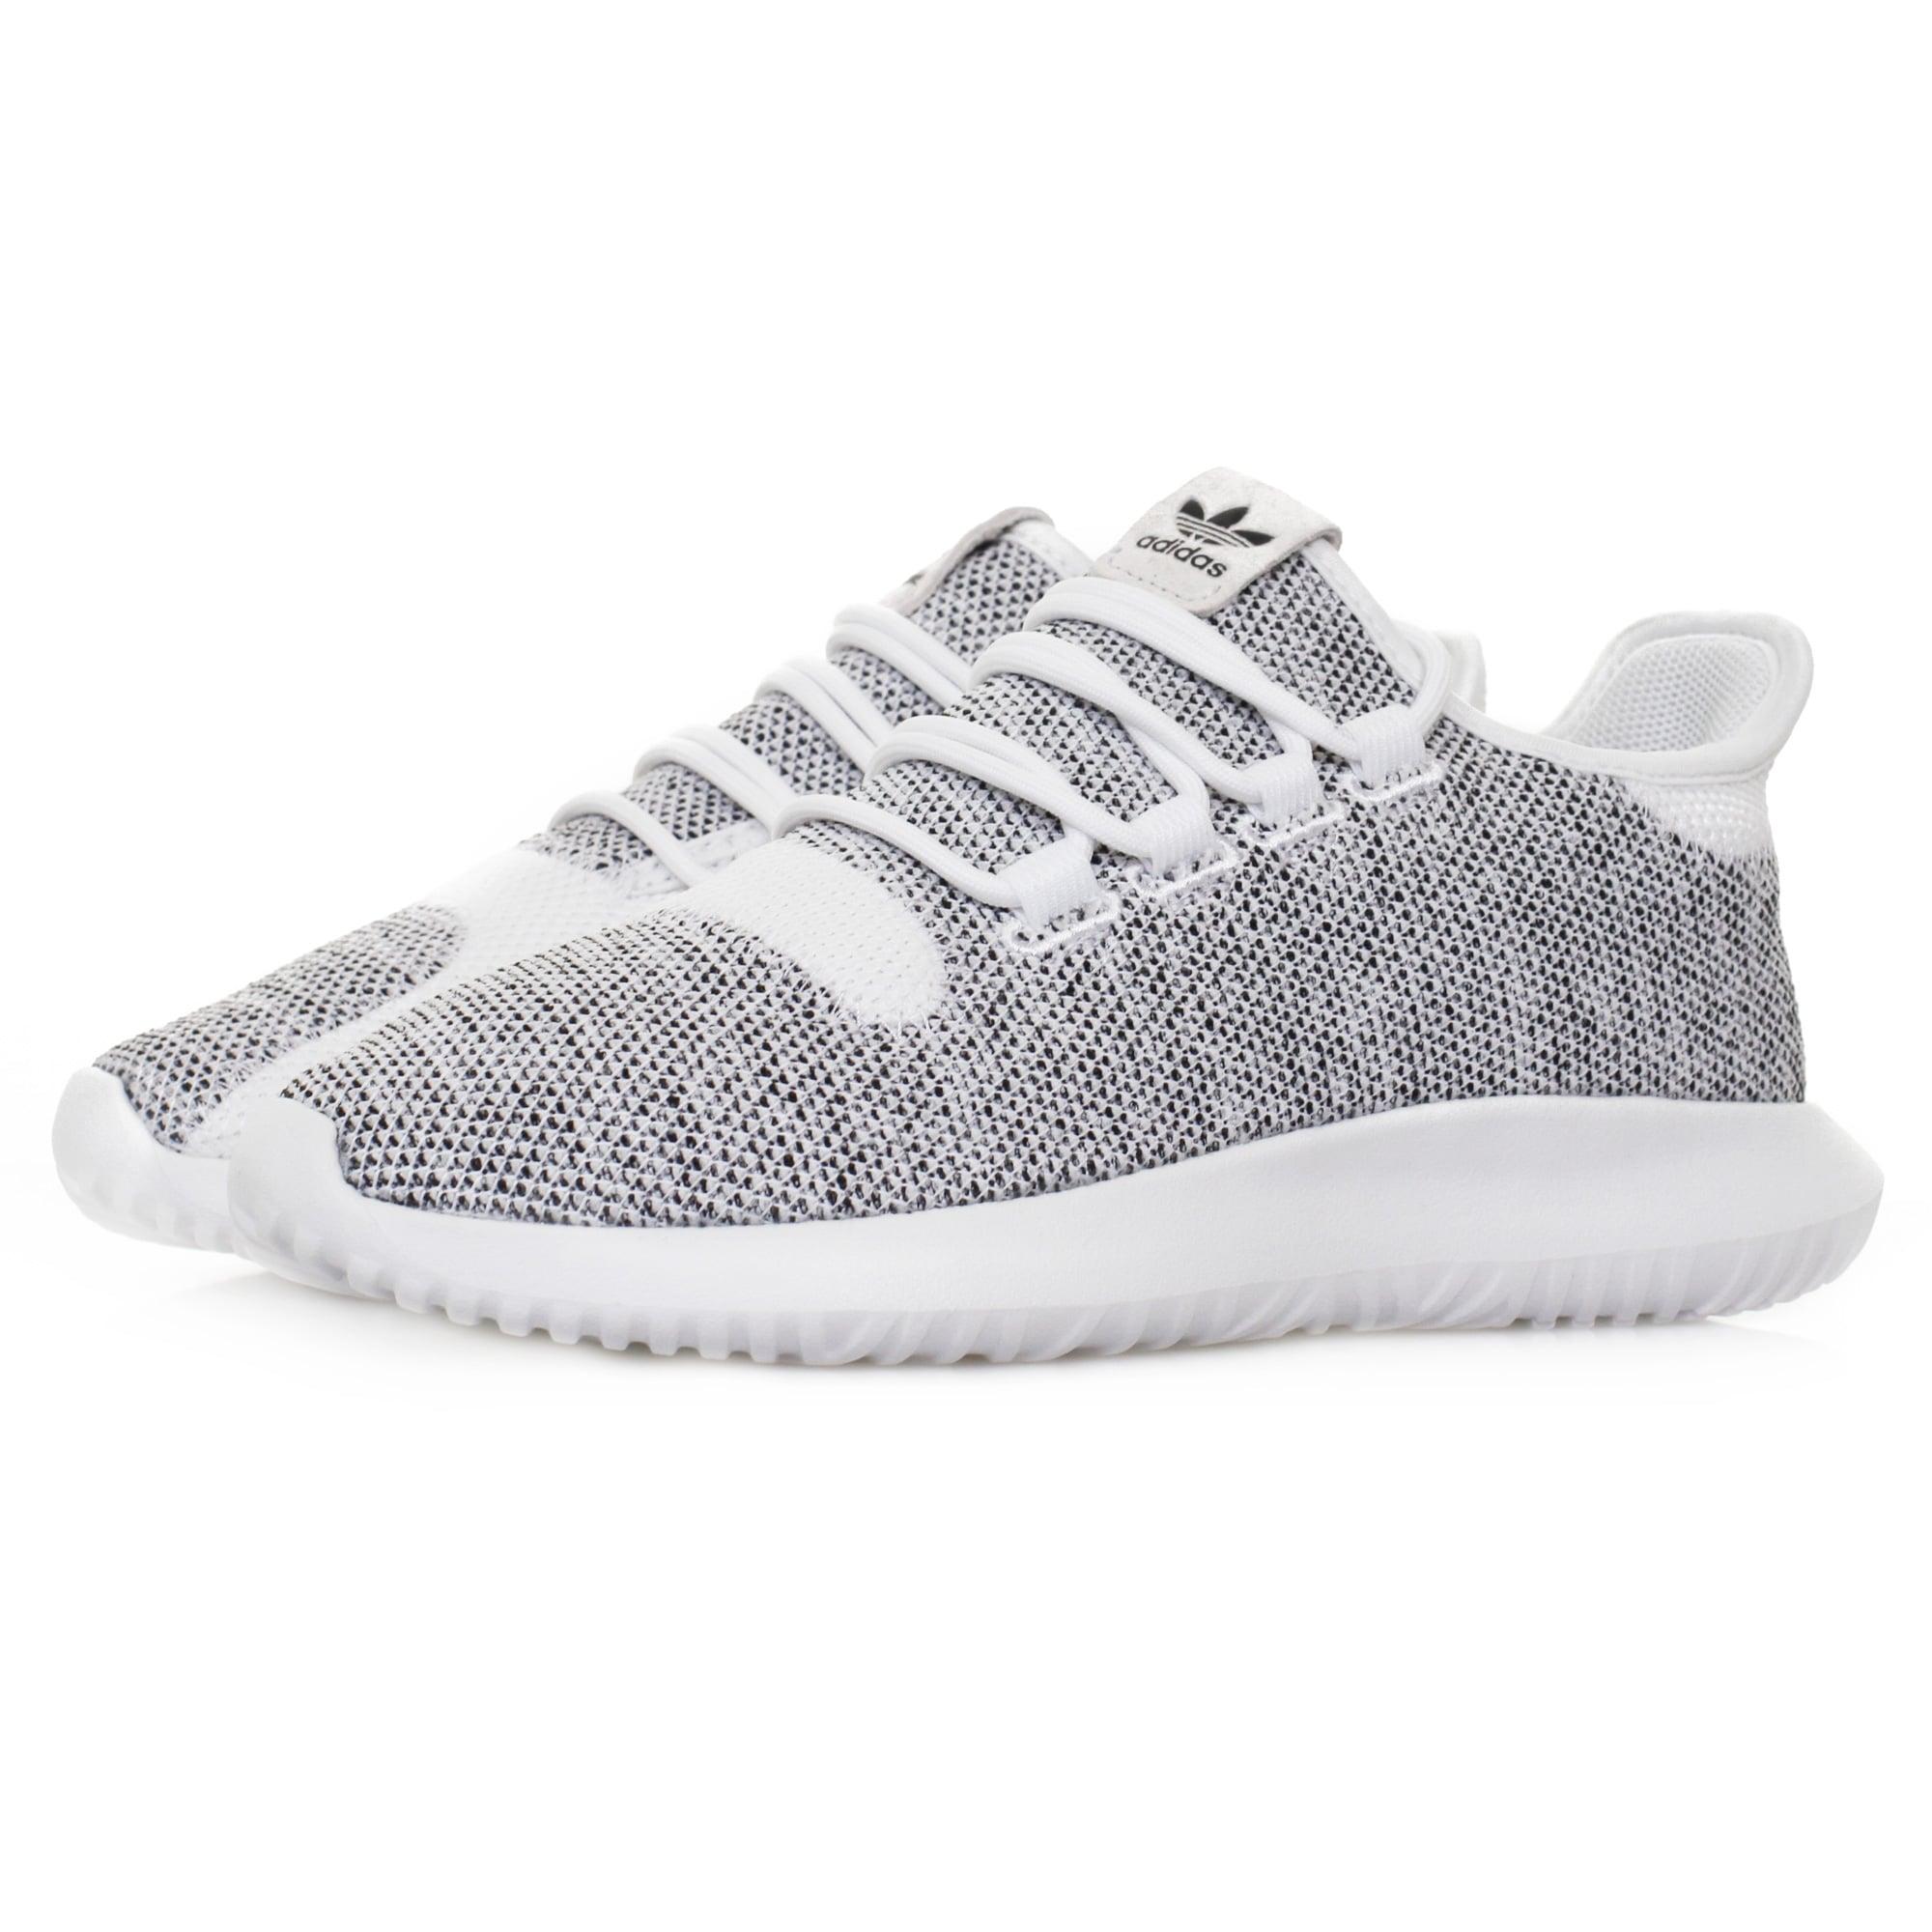 Adidas Originals Rørformet Skygge Strikke Sko krmT2BLDJI